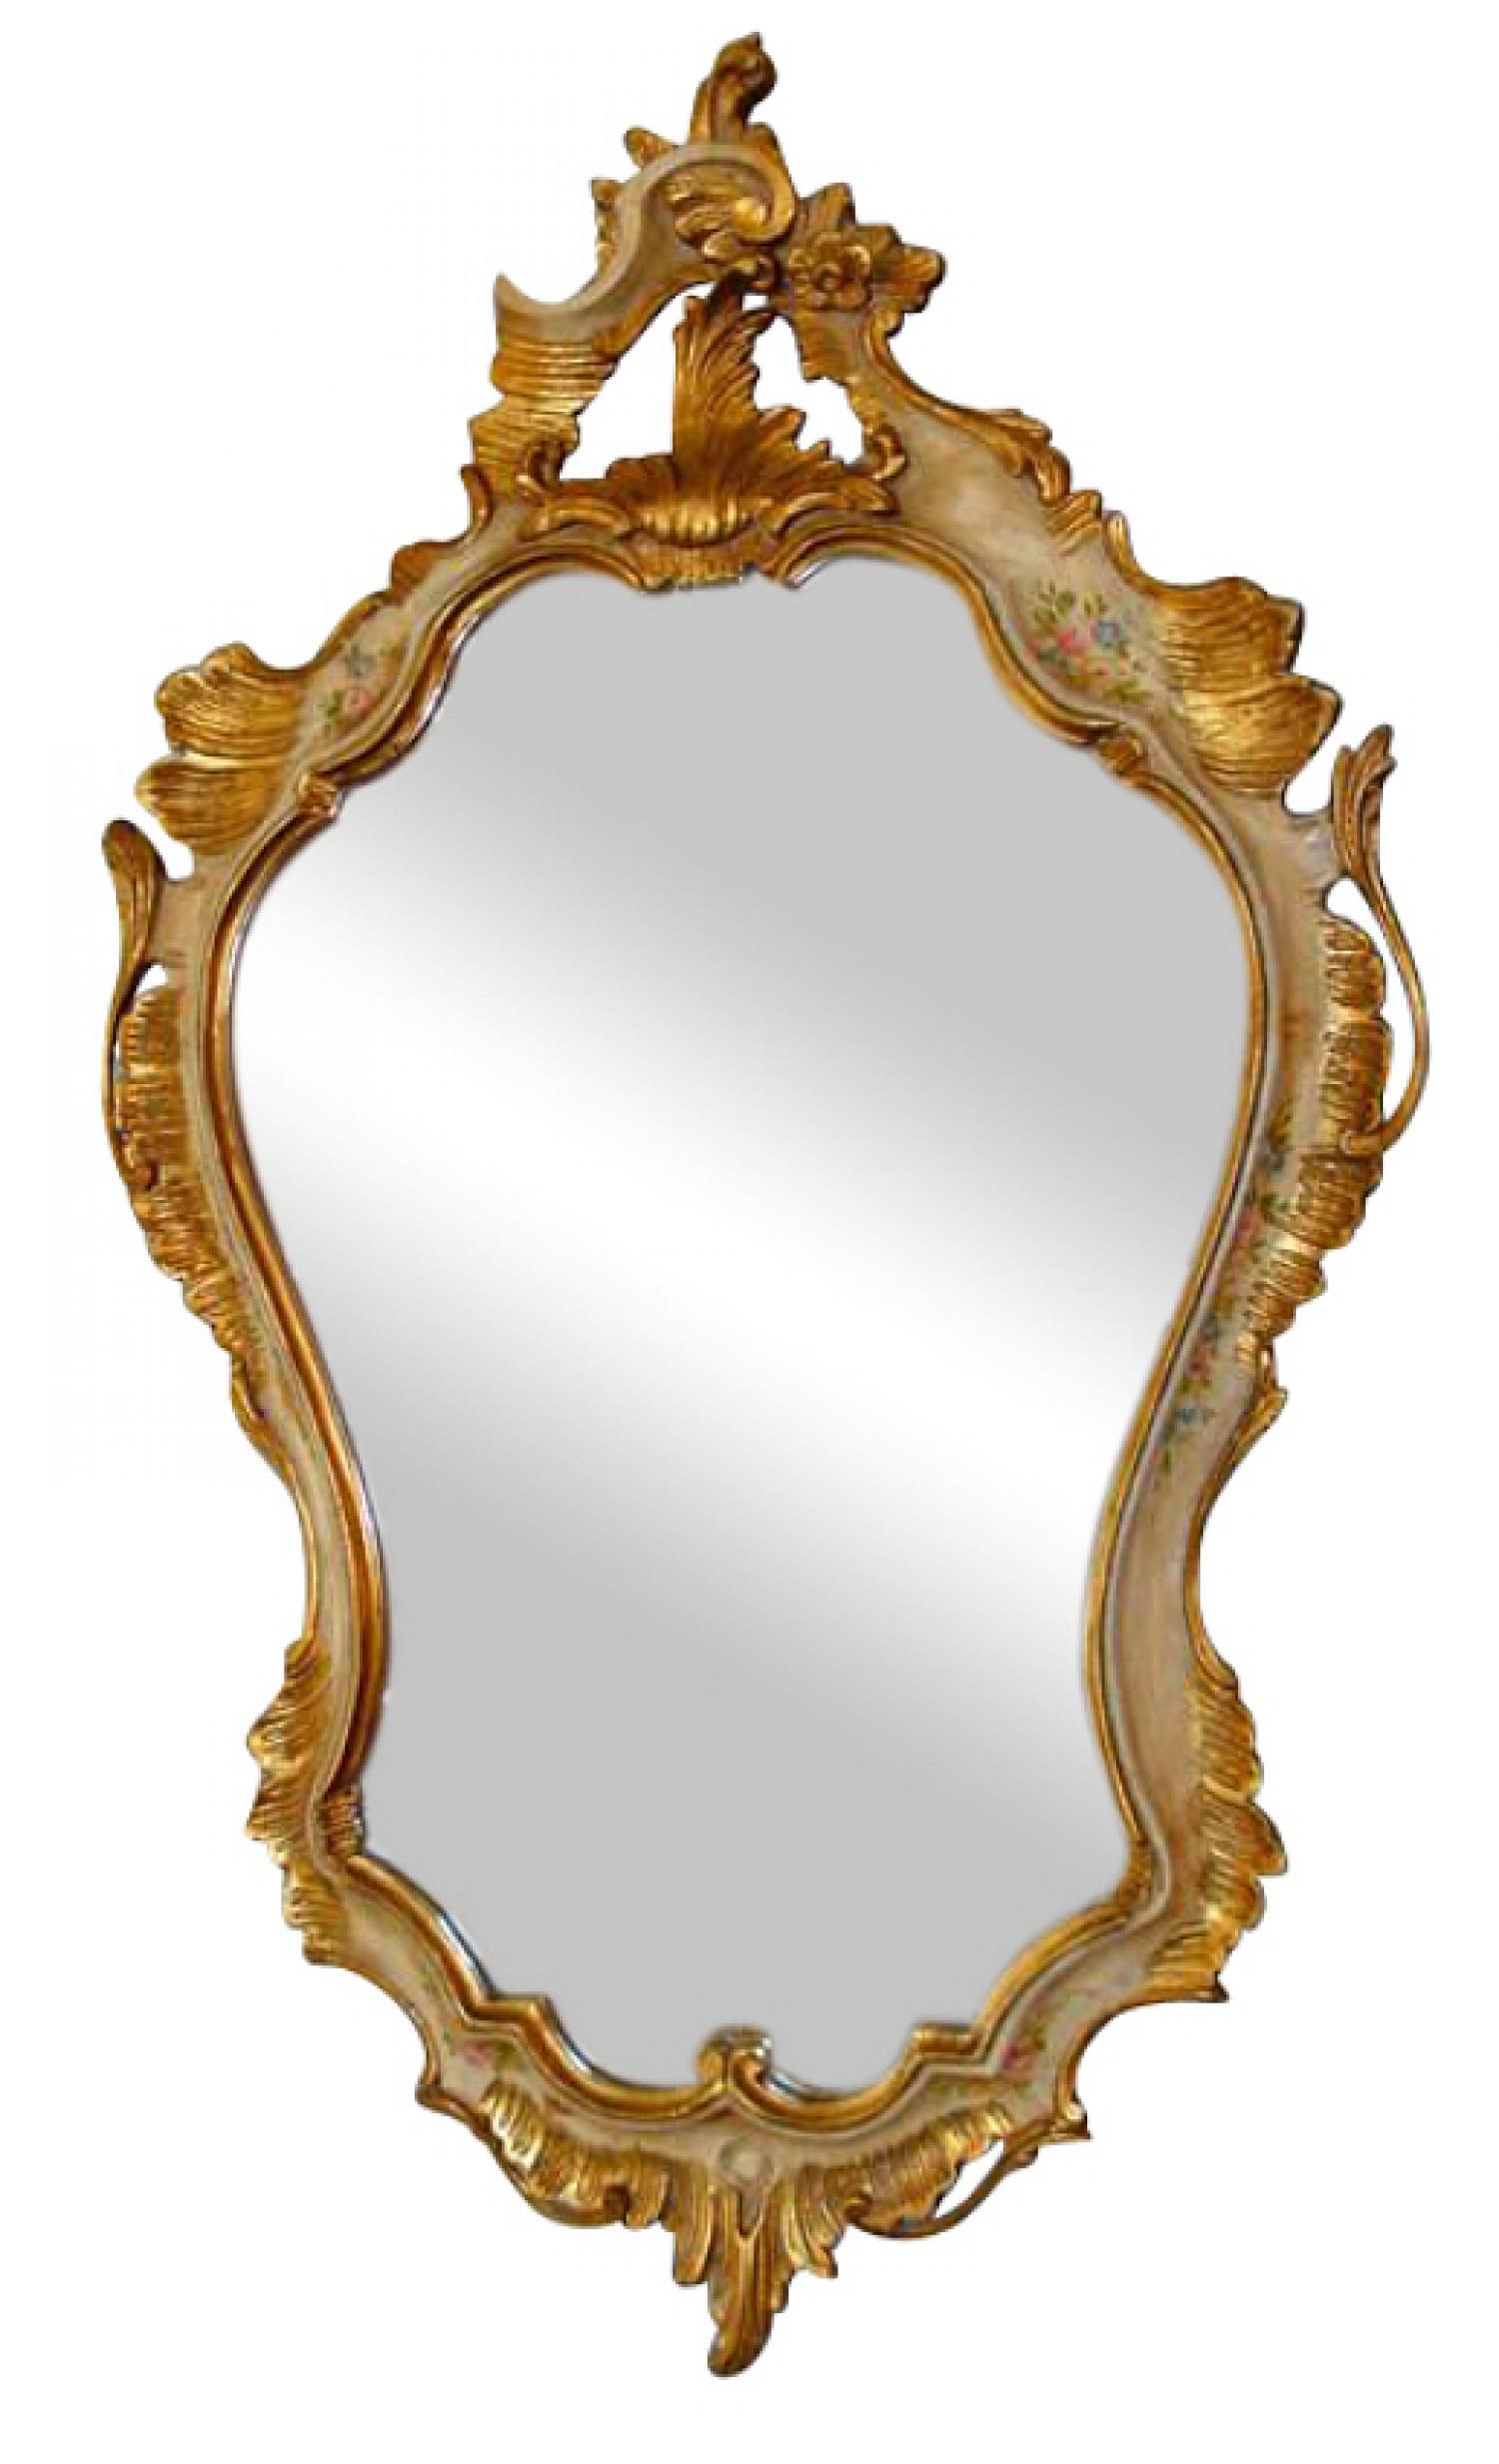 Venetian Rococo style cartouche shaped mirror c1910